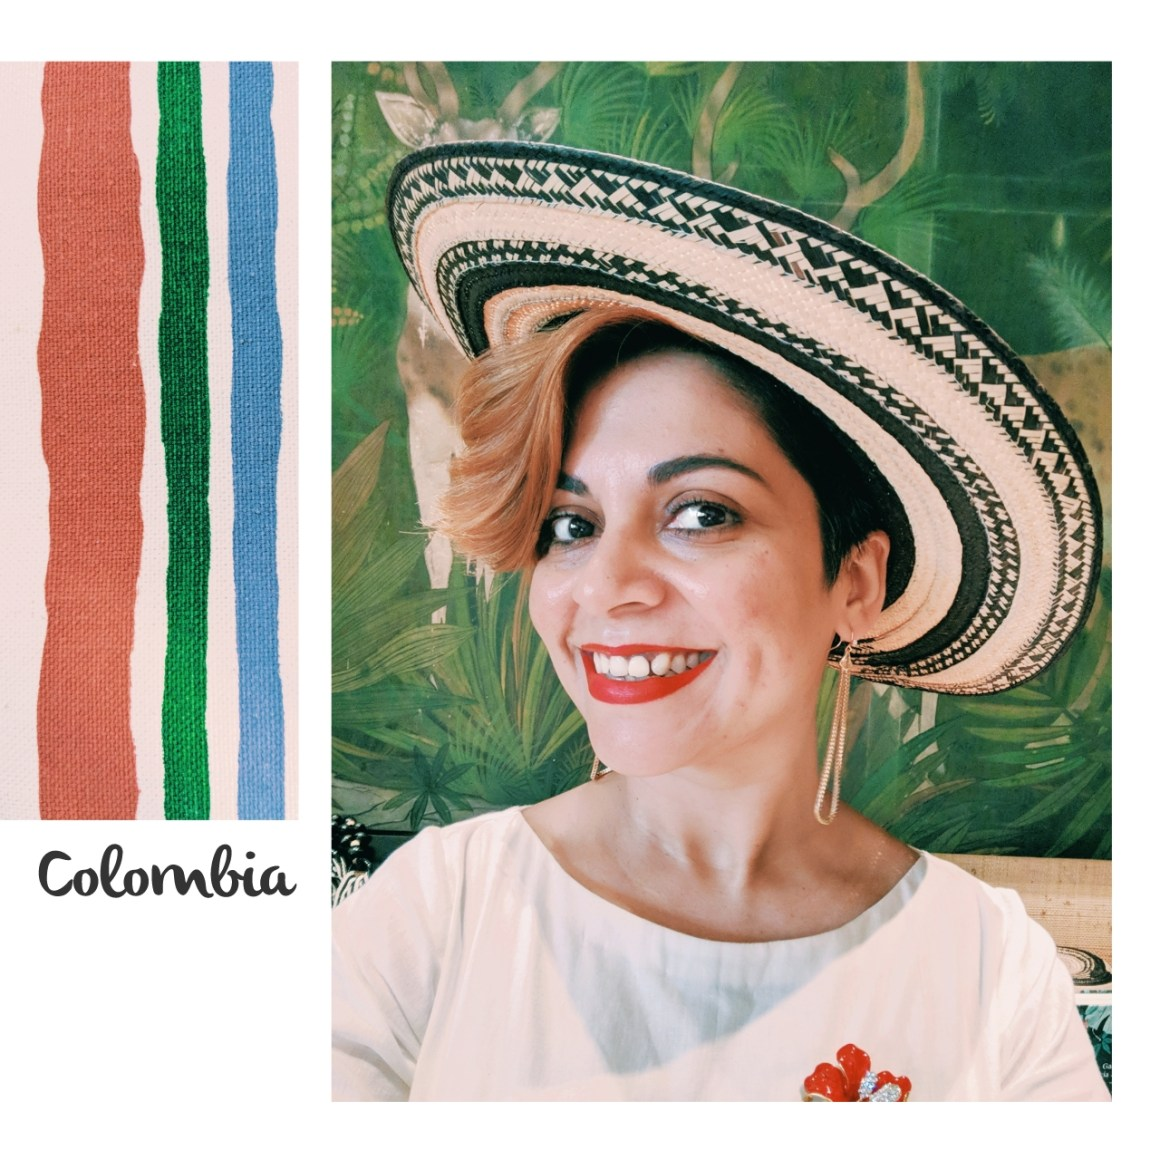 Naina.co, Naina Redhu, Colombia, Ambassador of Colombia, New Delhi, India, EyesForDestinations, EyesForColombia, SalvoPatria, Bogota, Taj Mahal Hotel, Lunch, Coffee, Chef Juan Ortiz, Chef Alejandro Gutierrez, Celemencia Forero